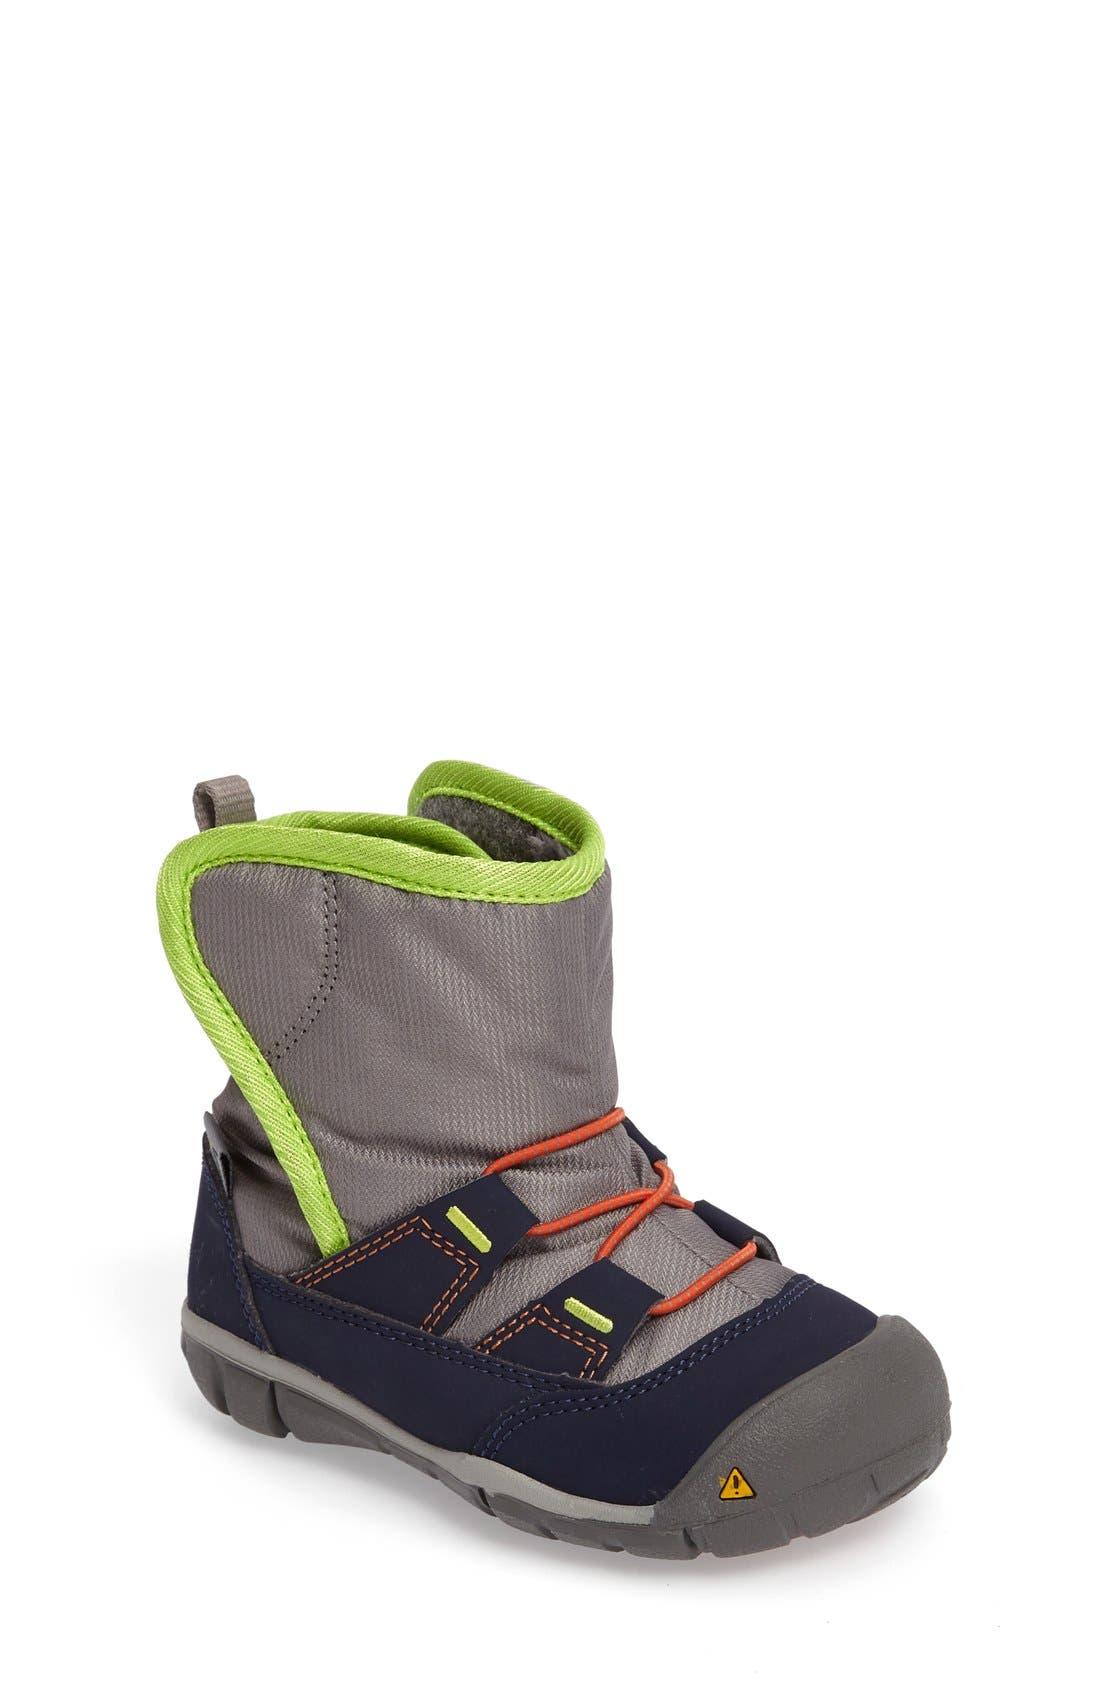 Alternate Image 1 Selected - Keen Peek-A-Boot Fleece Lined Boot (Baby & Walker)